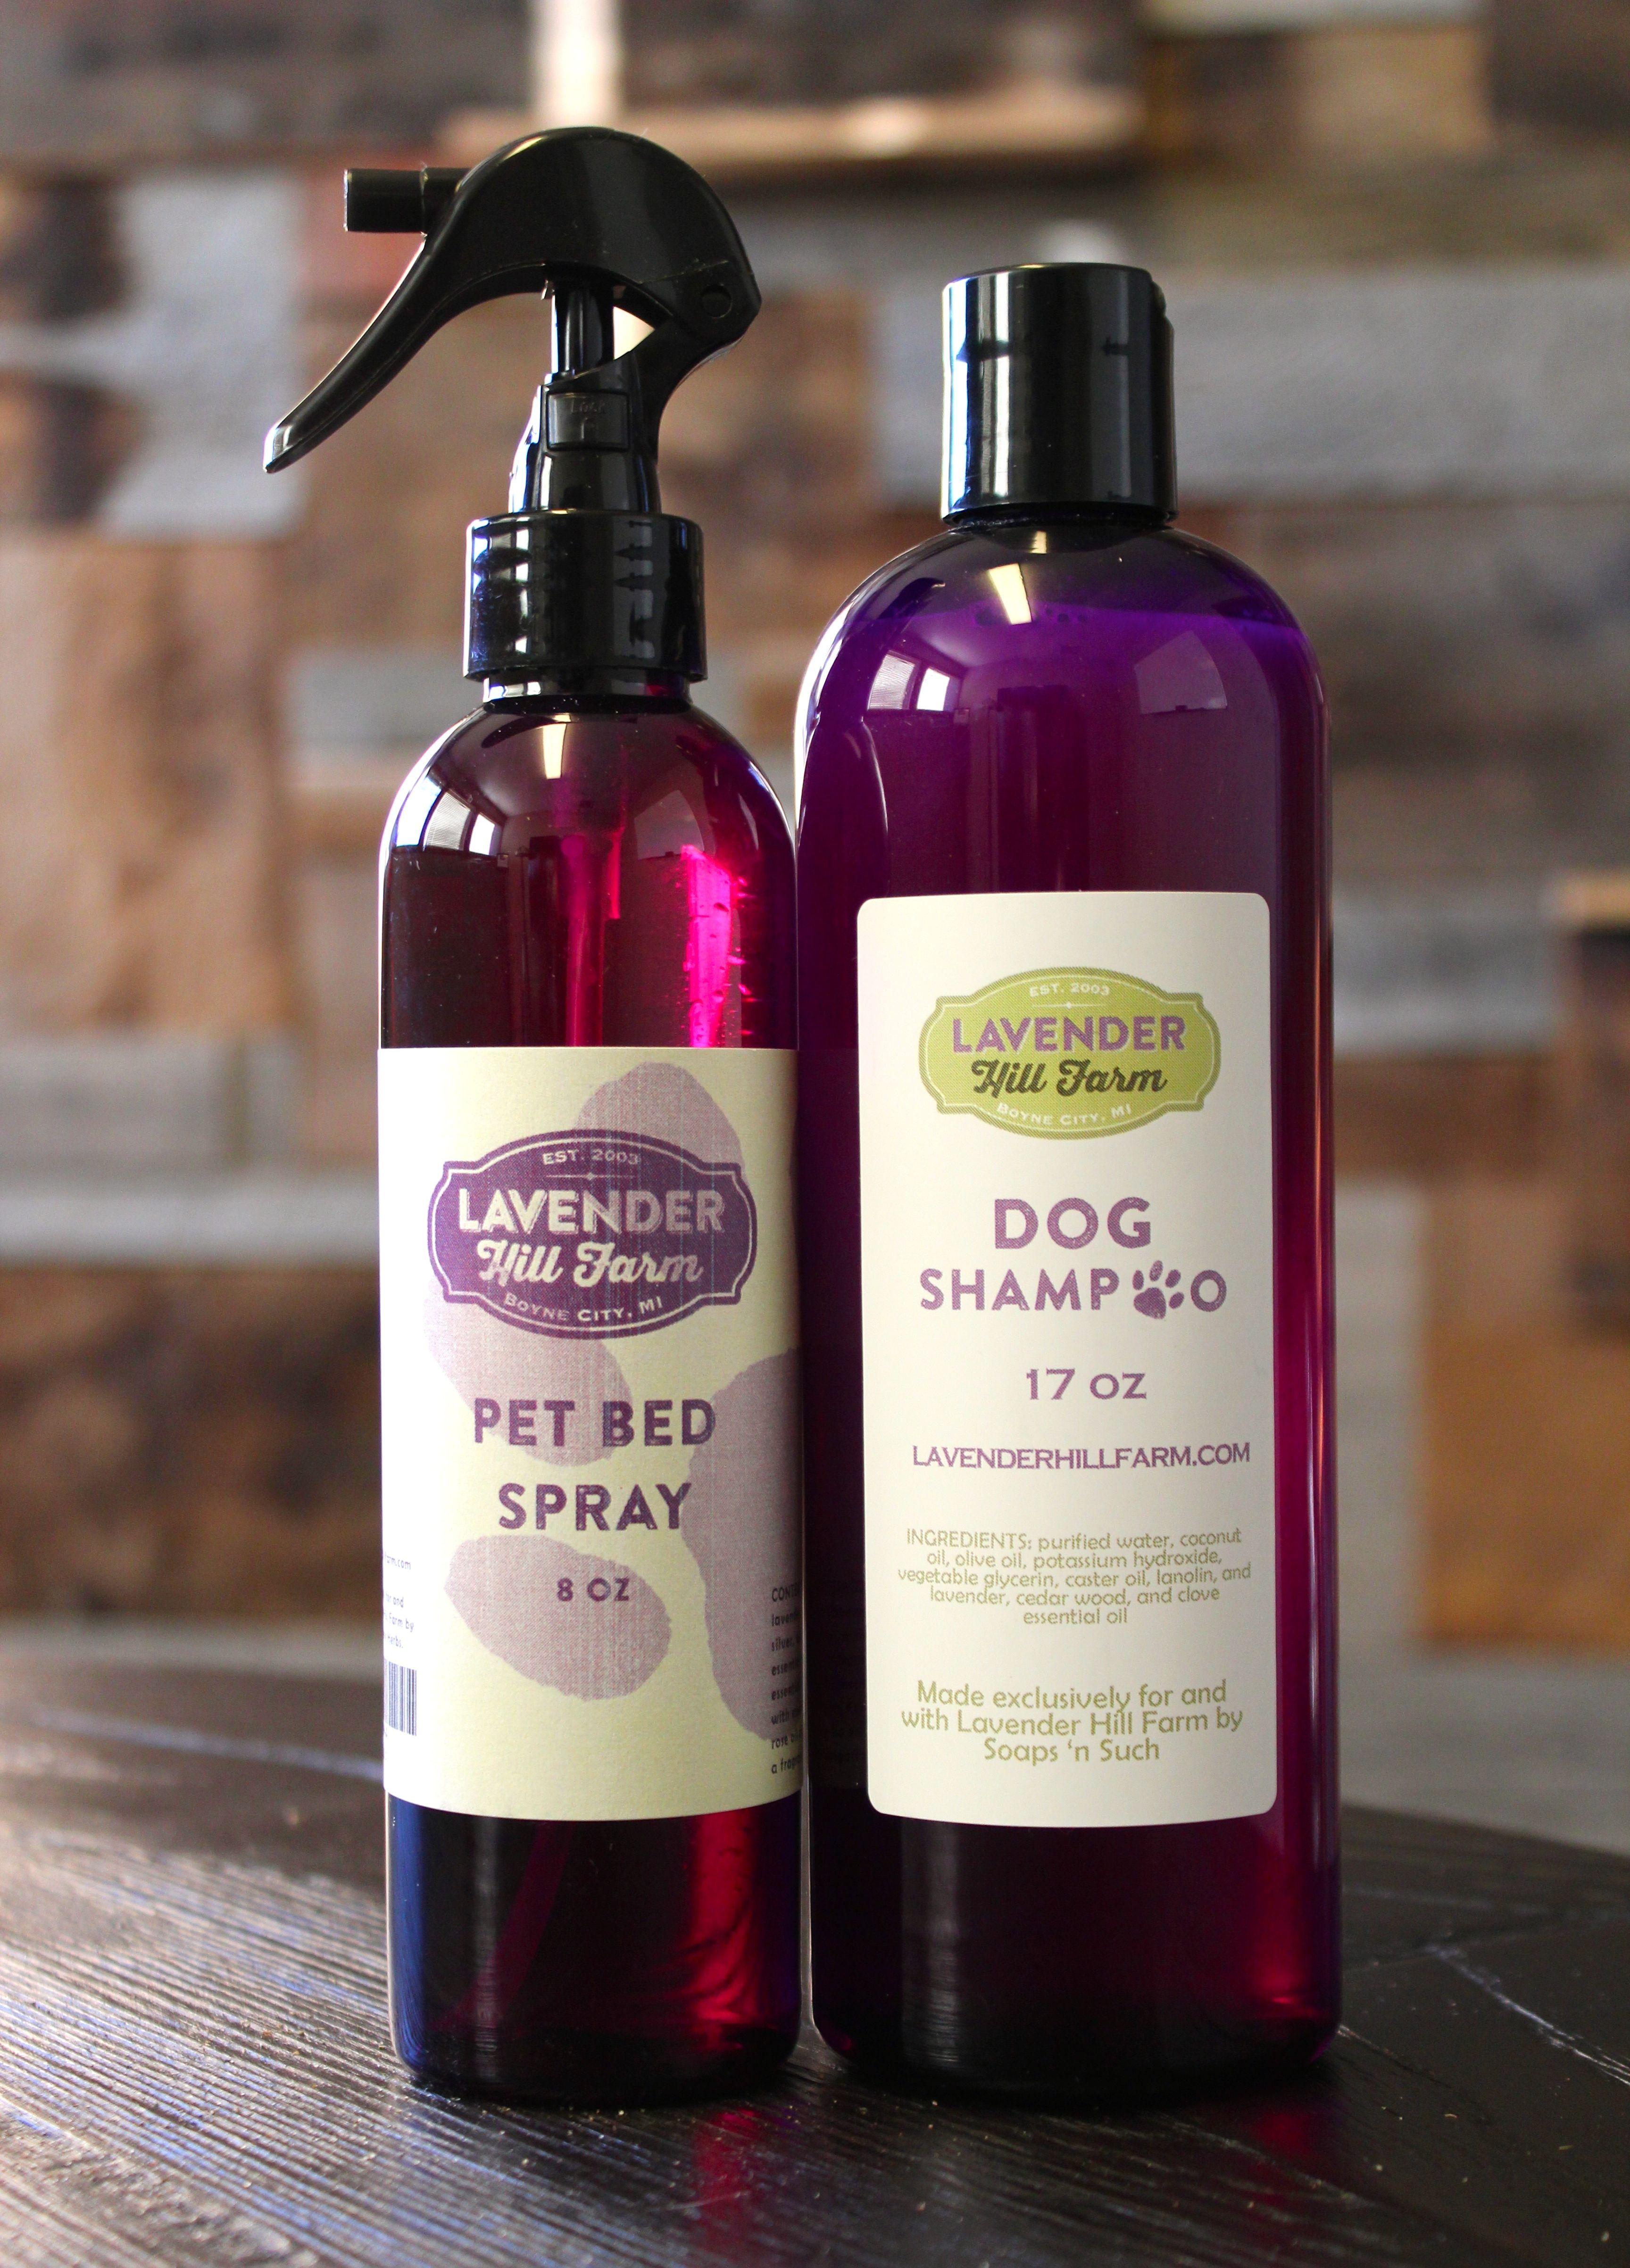 Lavender Doggy Box, Lavender, Dog Shampoo, Pet Bed Spray